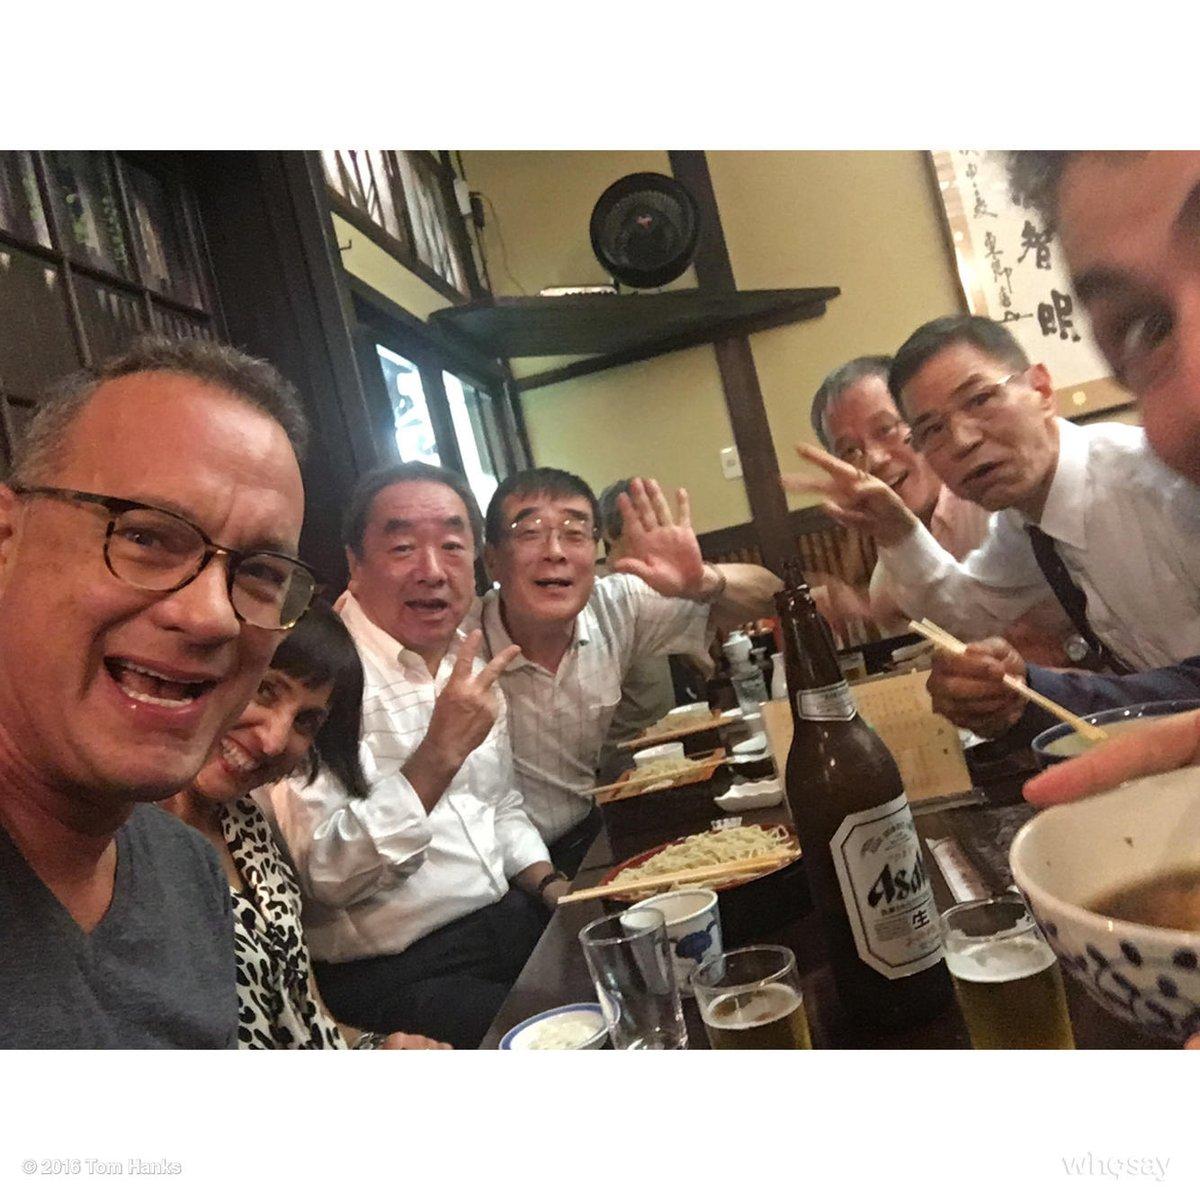 Rocking Tokyo with my crew. Hanx. https://t.co/U1gG22KHhq